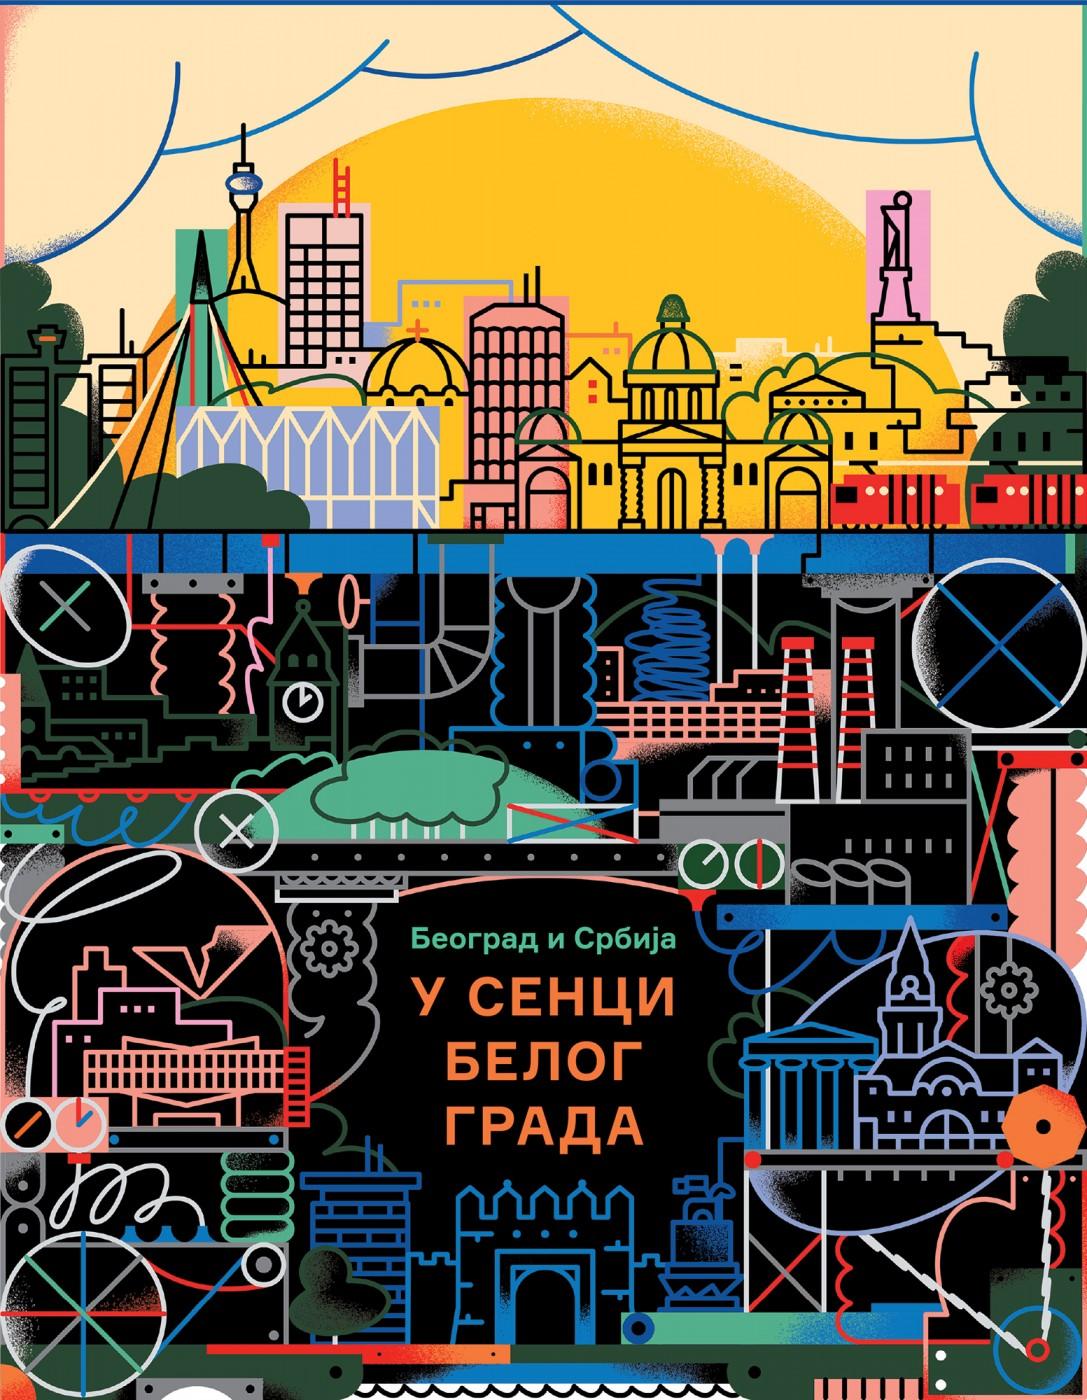 bratislav-milenkovic_elementi-magazine